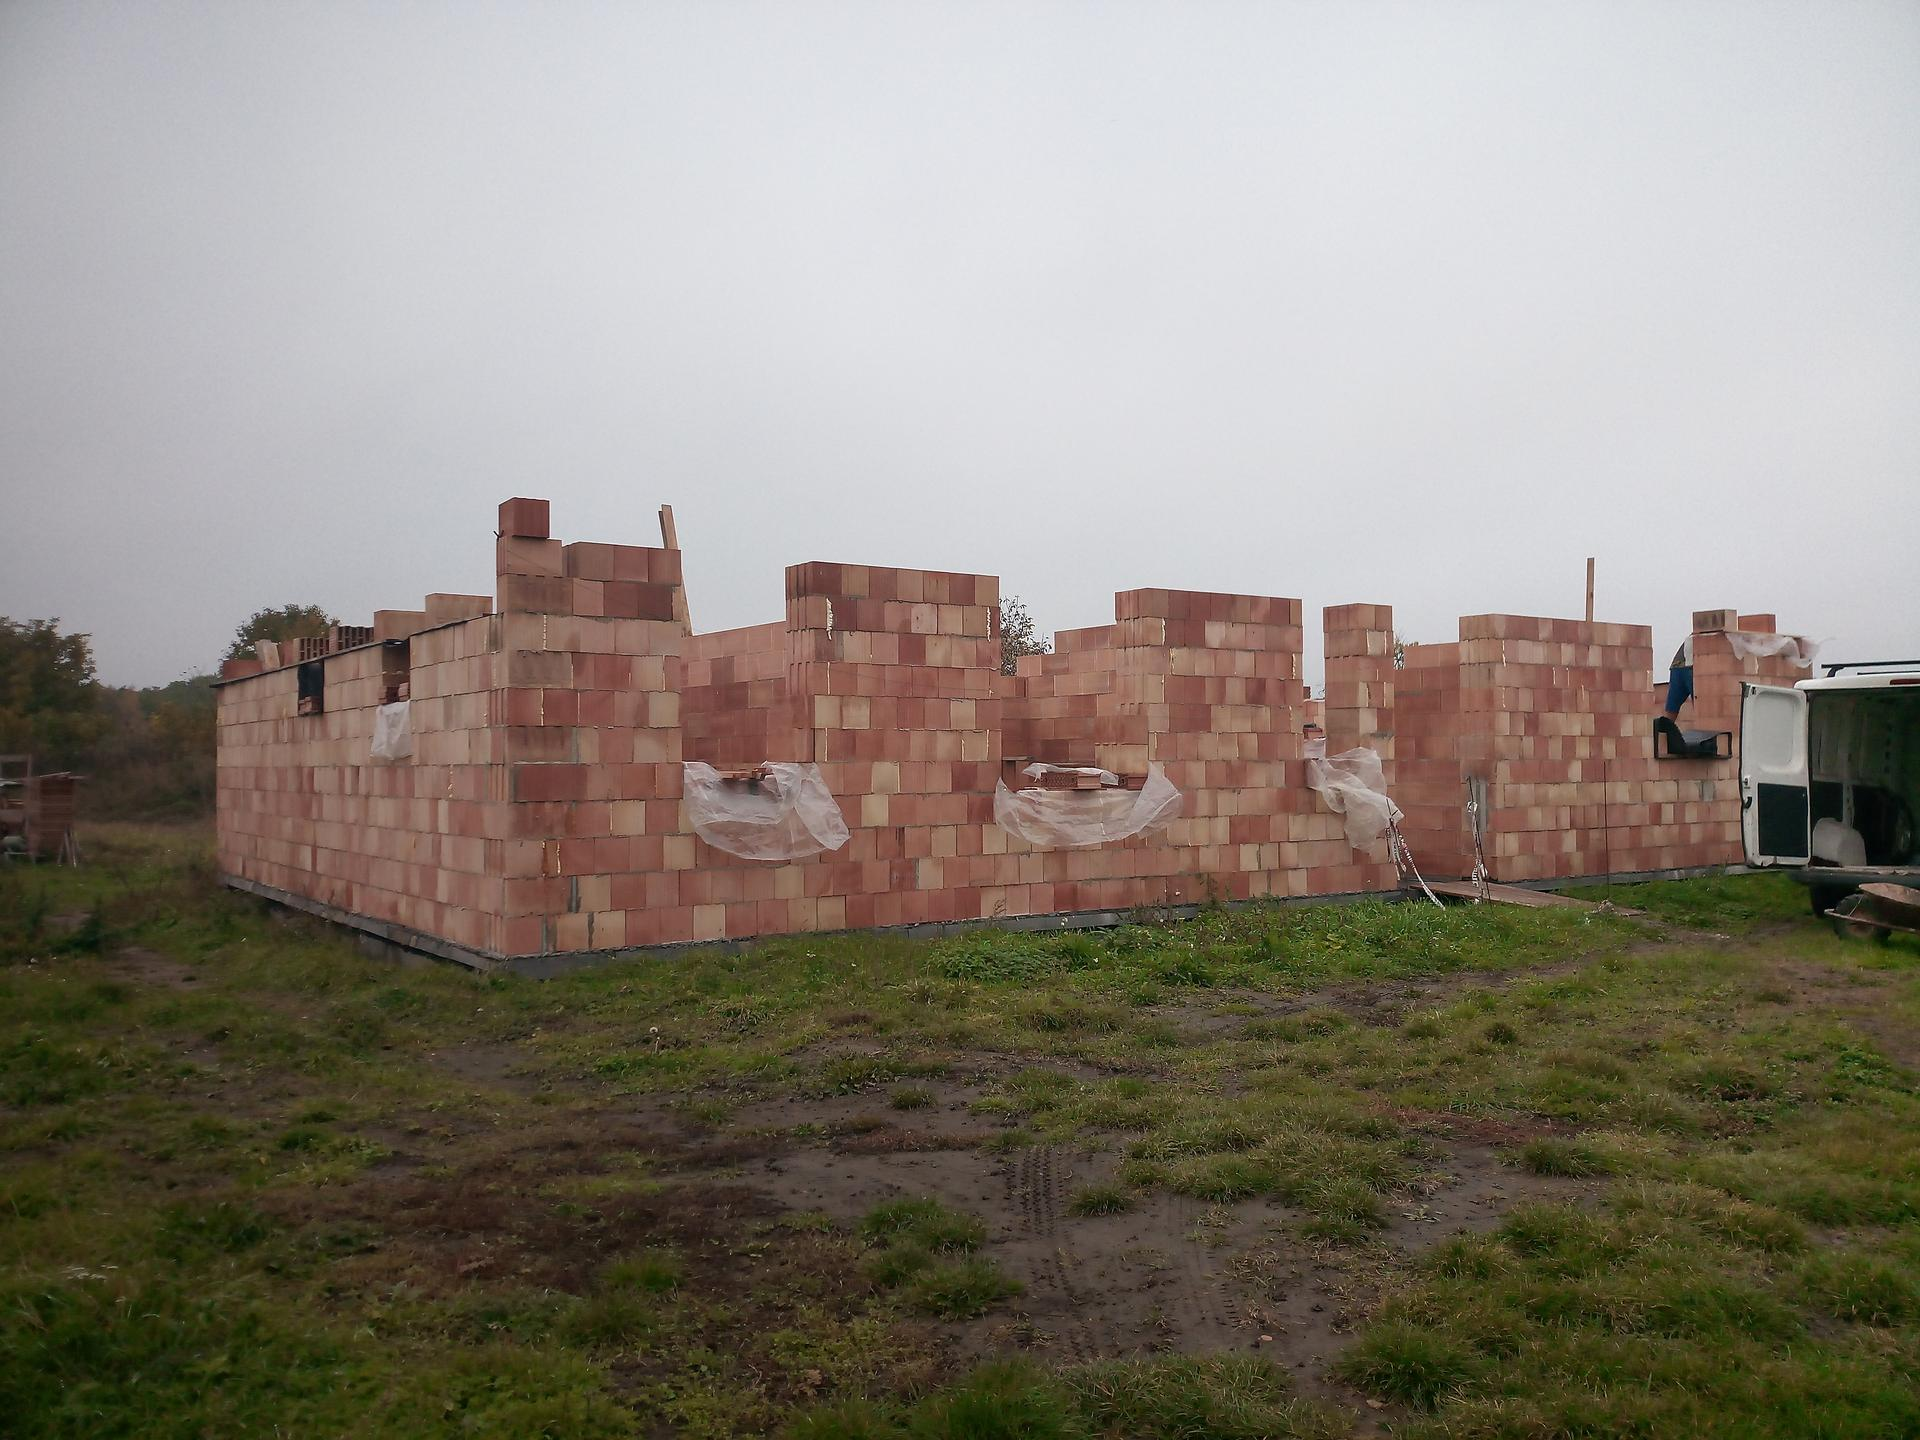 hrubá stavba - Obrázek č. 37